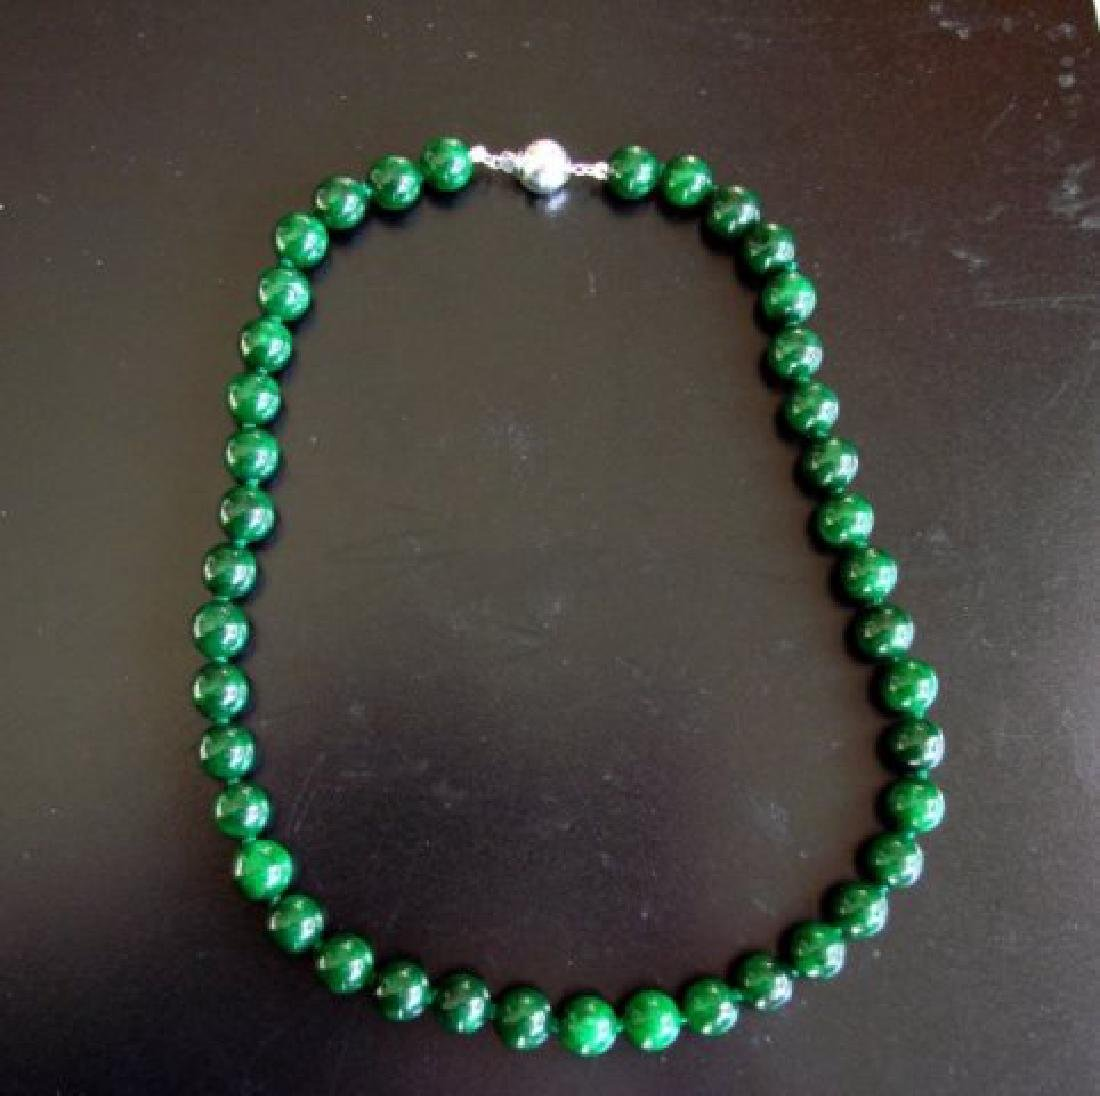 Natural Jadeite Jade Bead Green Spinach Necklace